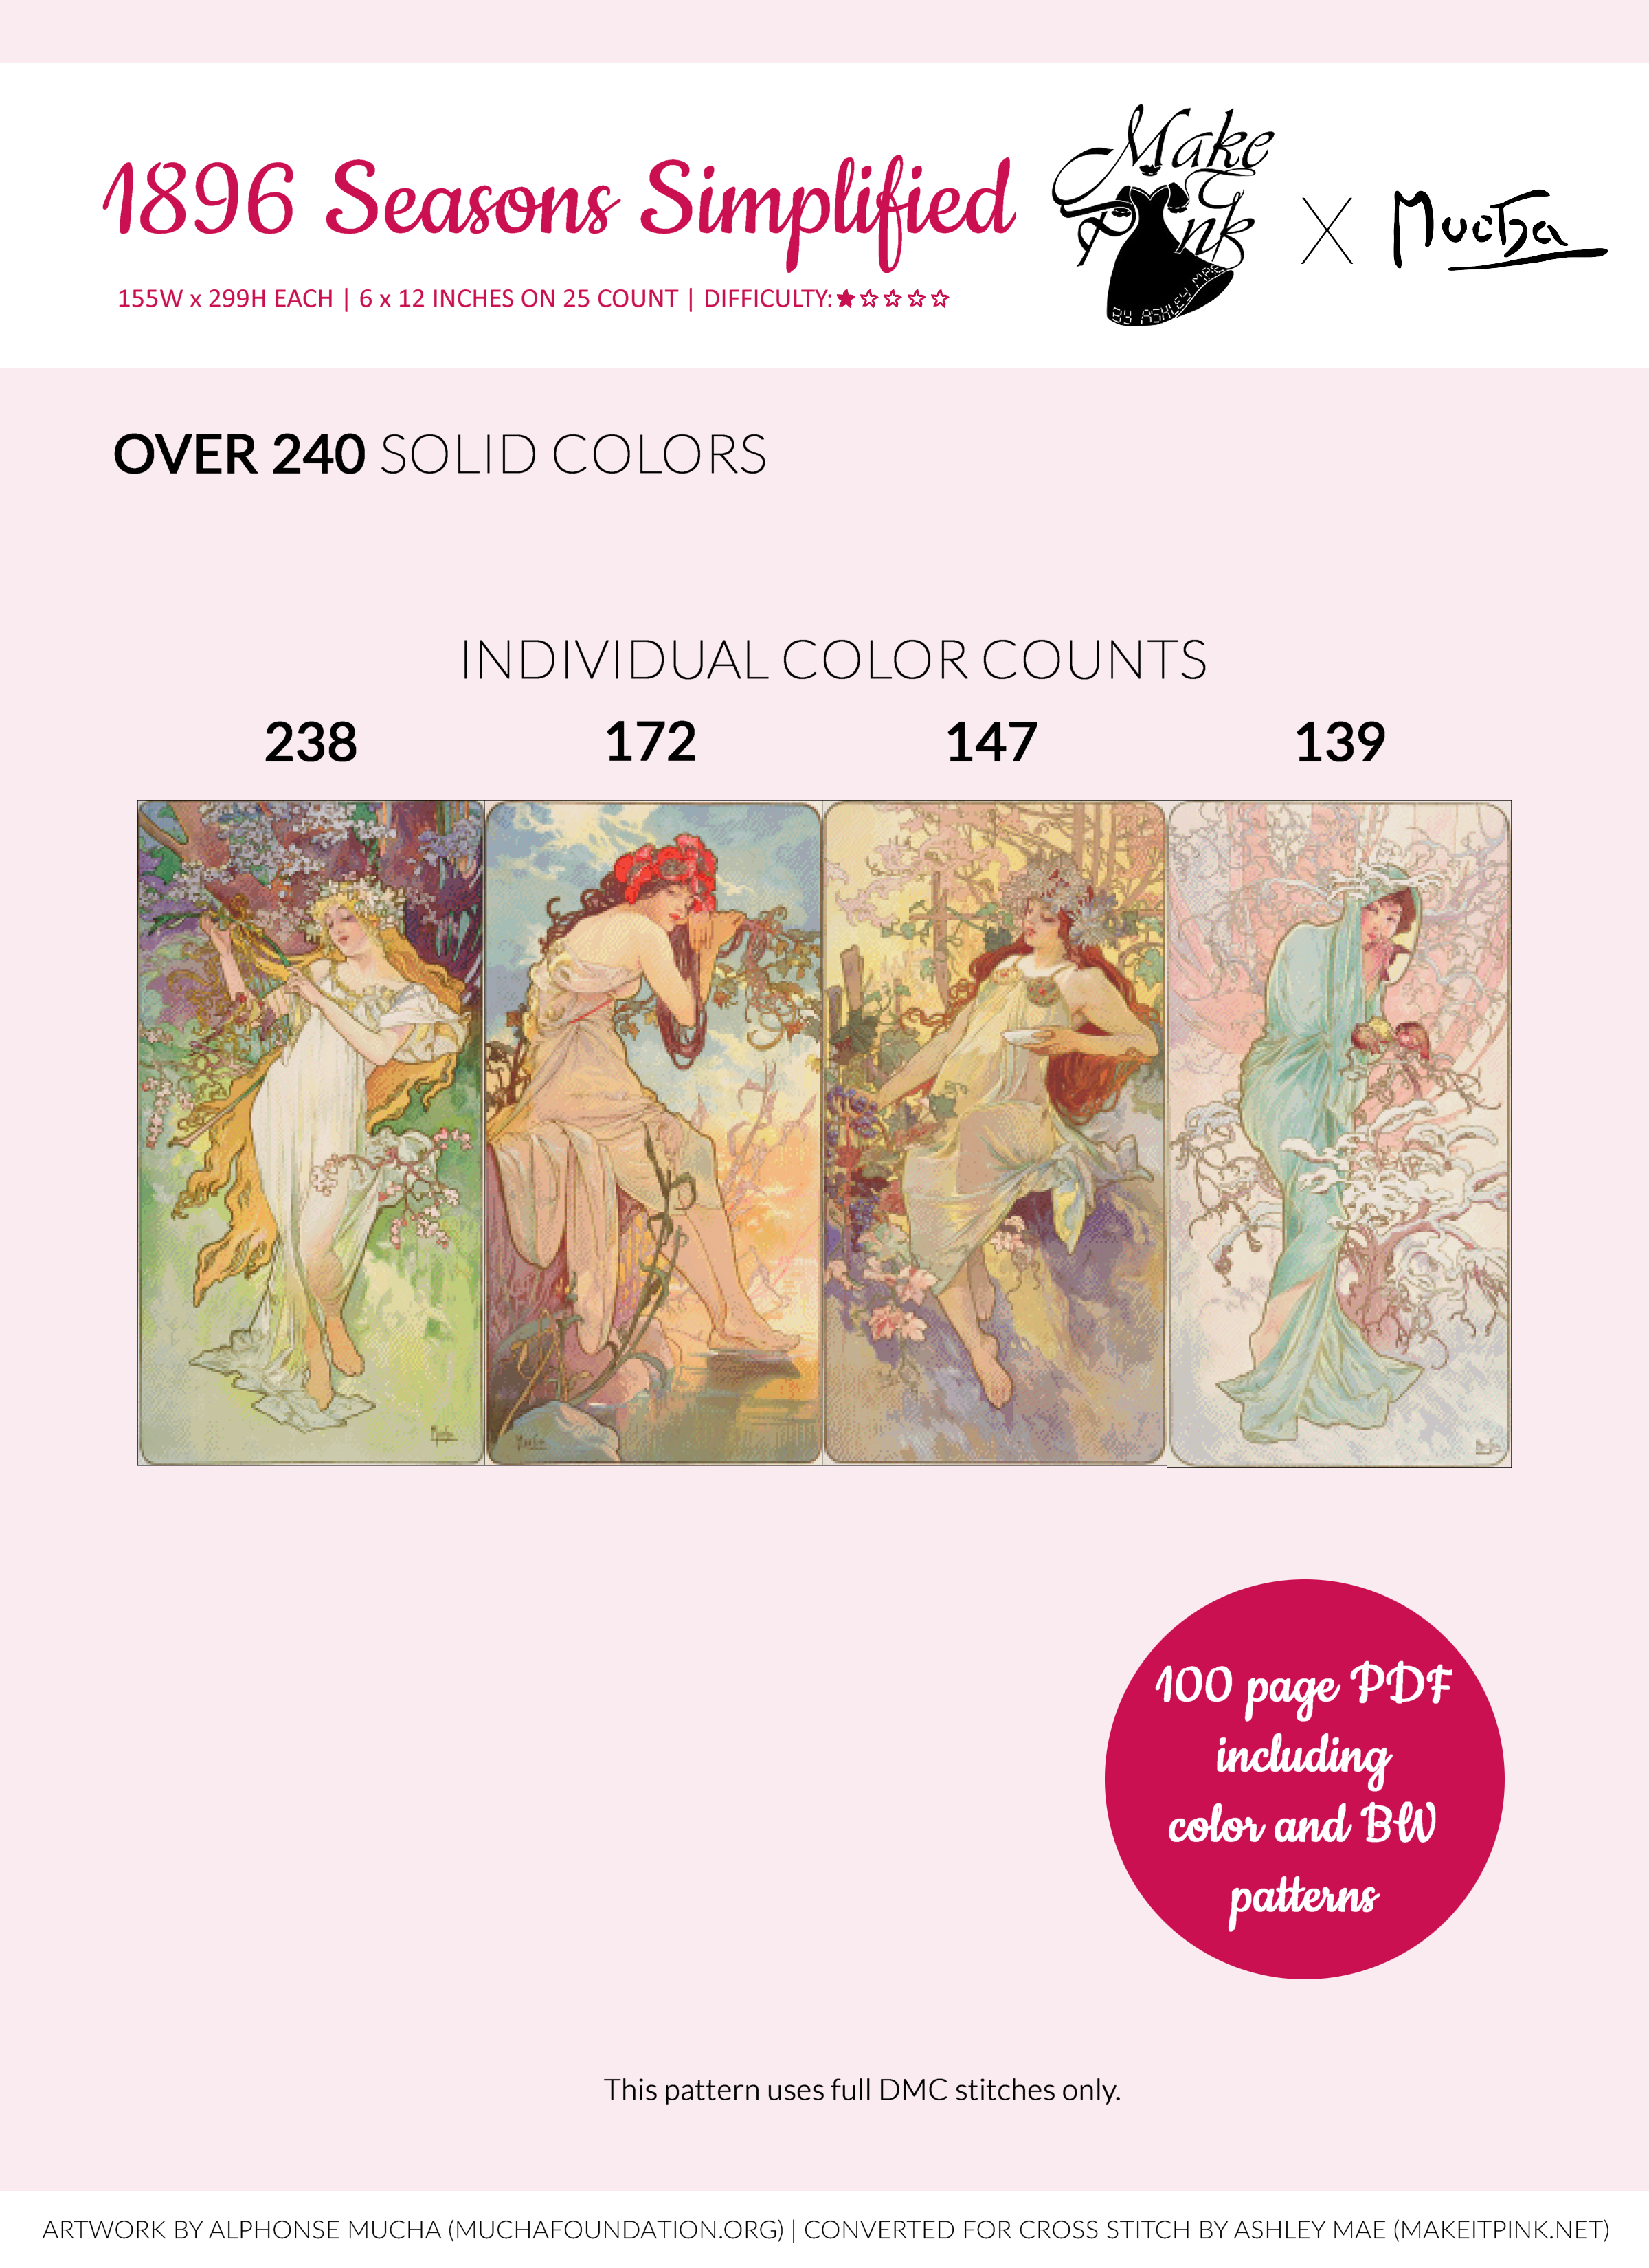 Simple Set (Alphonse Mucha 1896 Seasons)